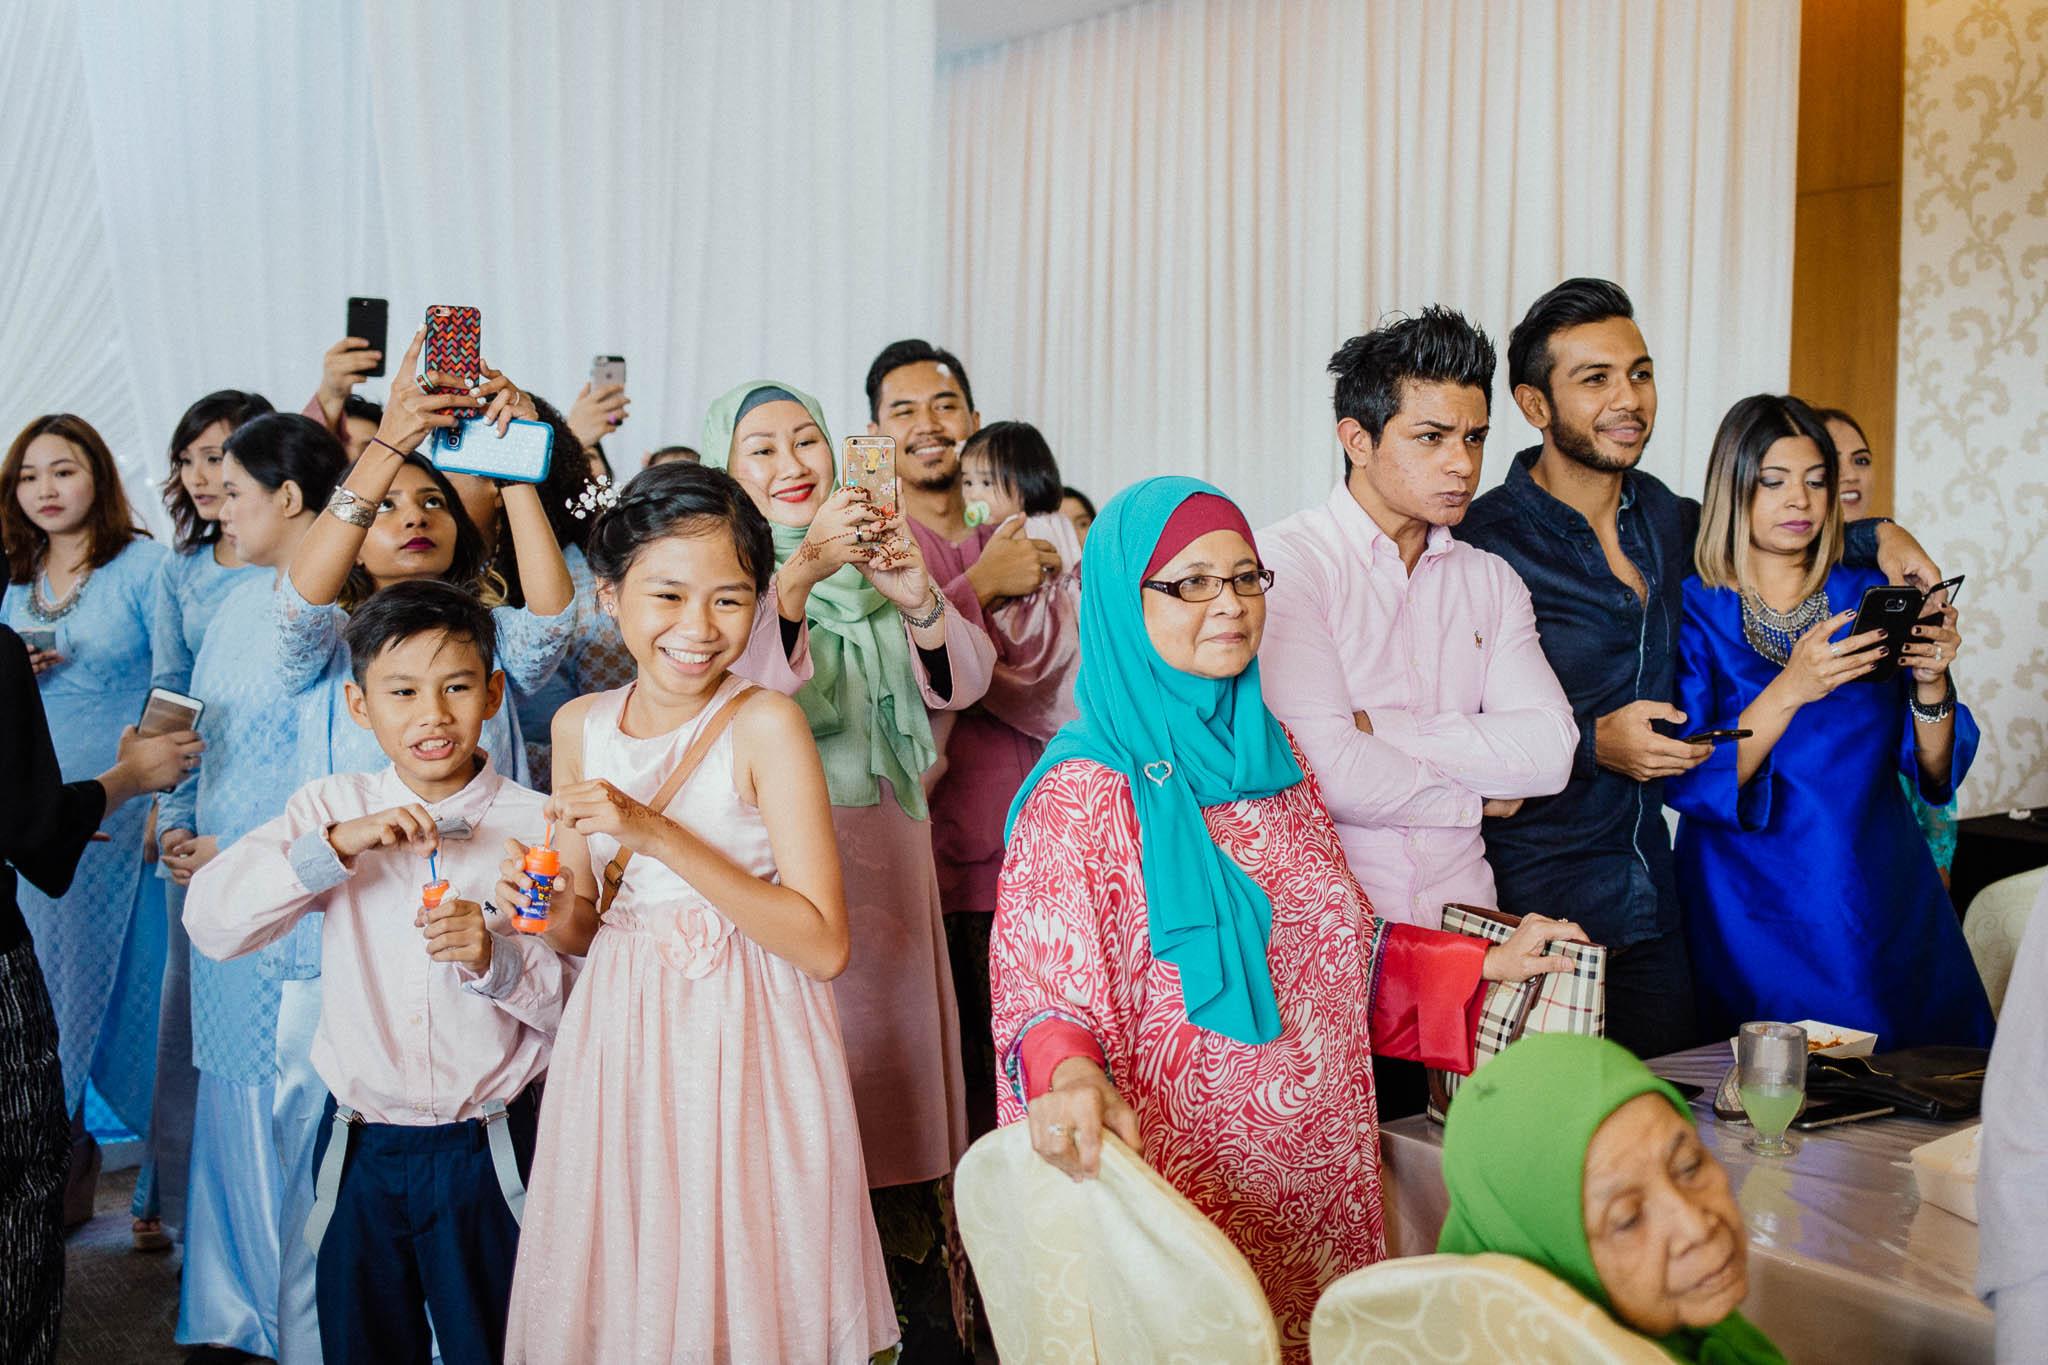 singapore-wedding-photographer-addafiq-nufail-049.jpg